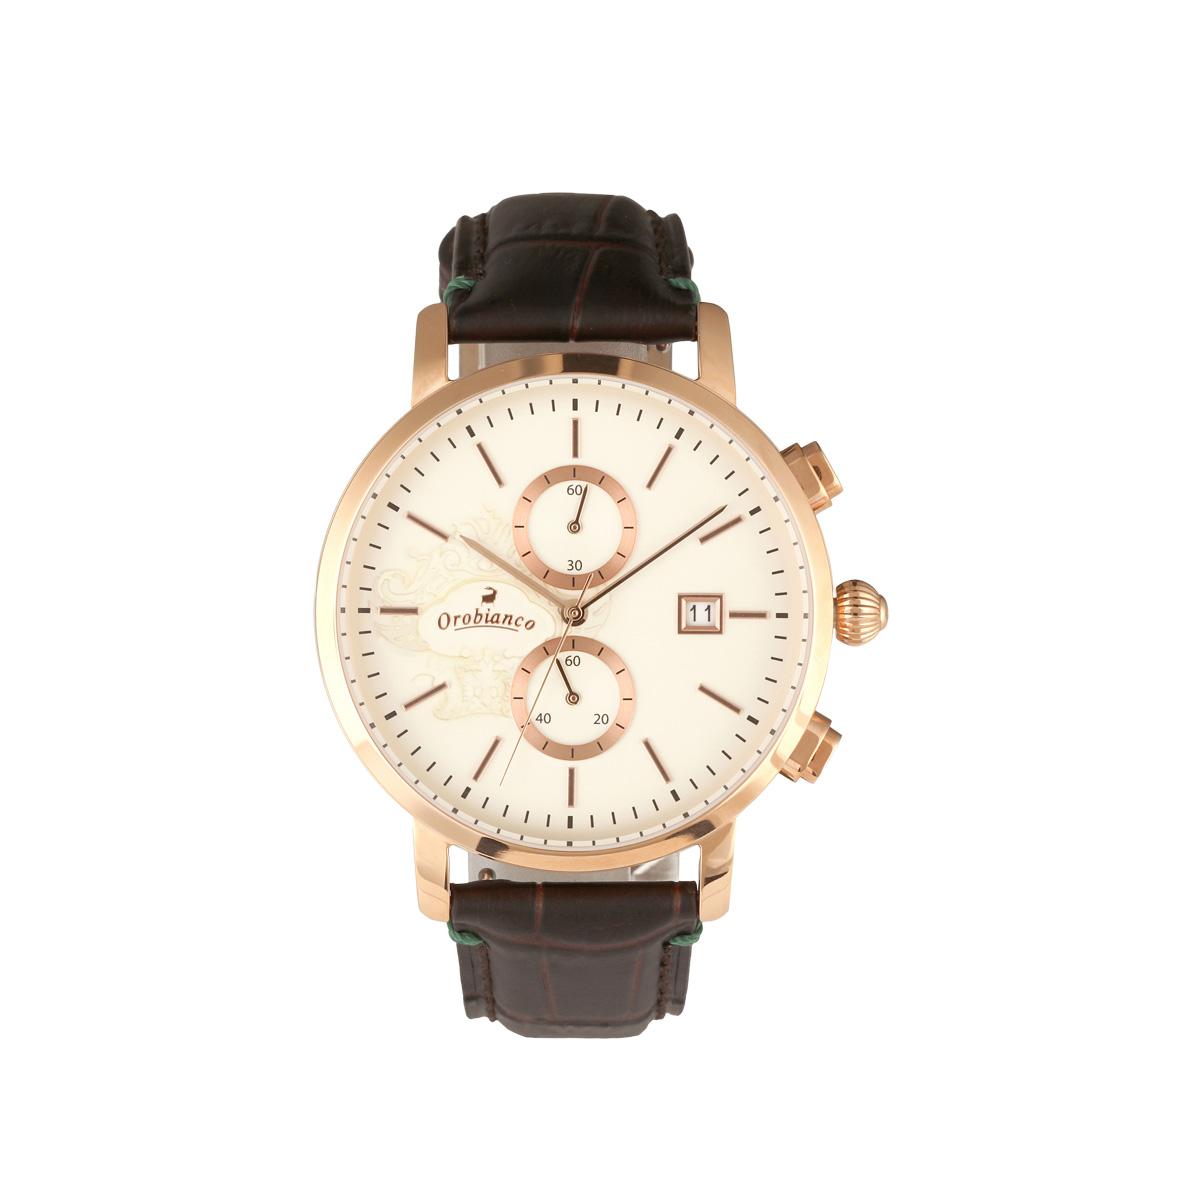 Orobianco CERTO オロビアンコ 時計 腕時計 メンズ クオーツ アナログ ダーク ブラウン OR0070-9 [2/26 新入荷]